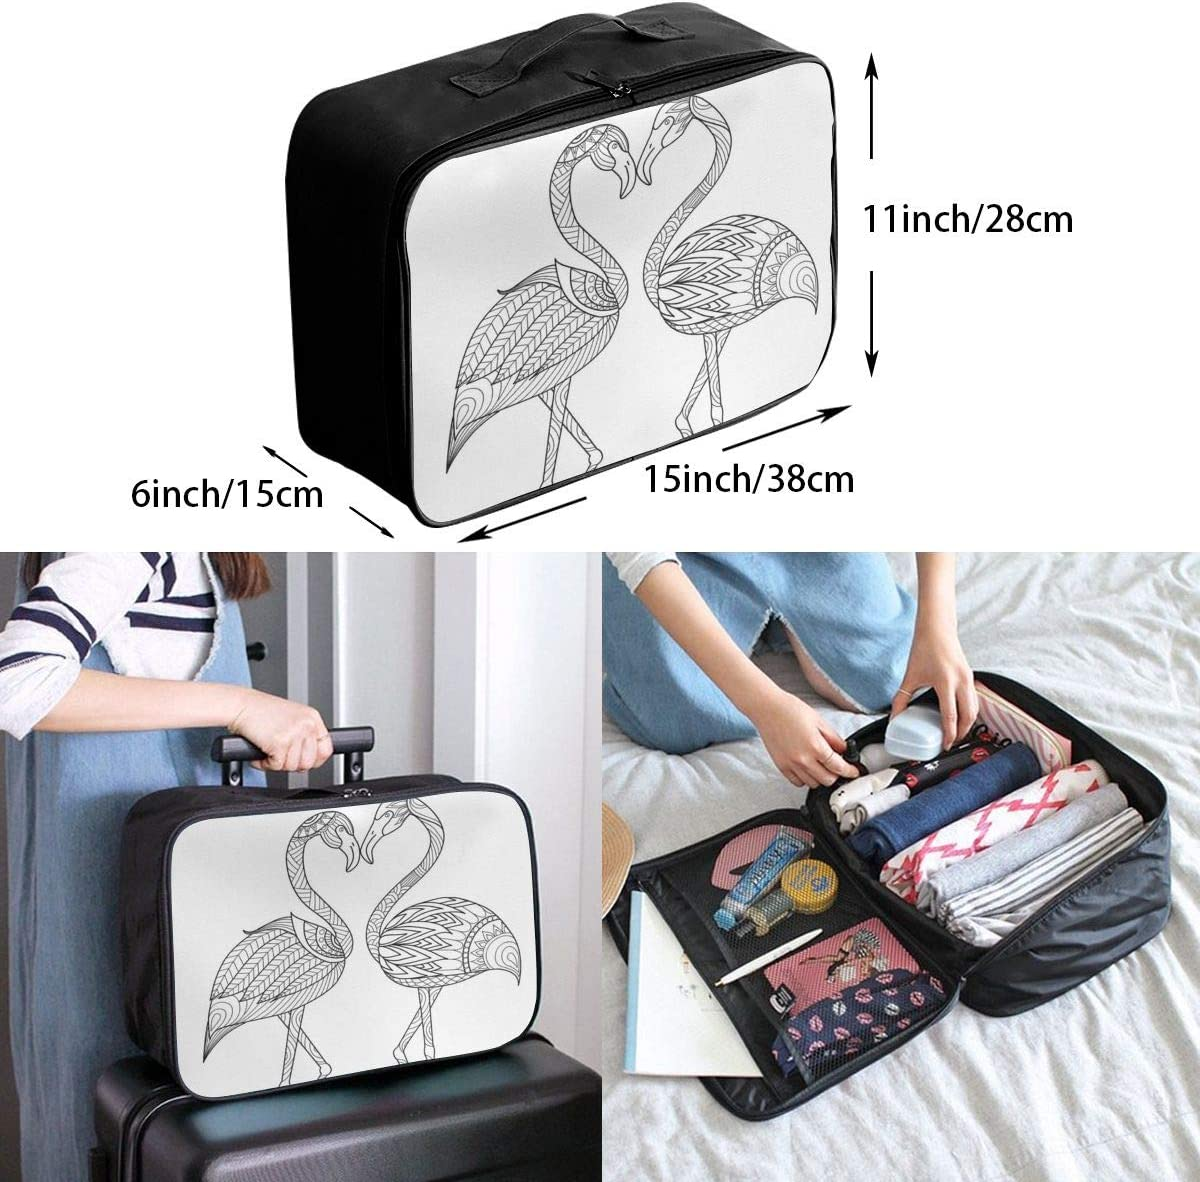 Yunshm Flamingo Coloring Vector Image Customized Trolley Handbag Waterproof Unisex Large Capacity For Business Travel Storage